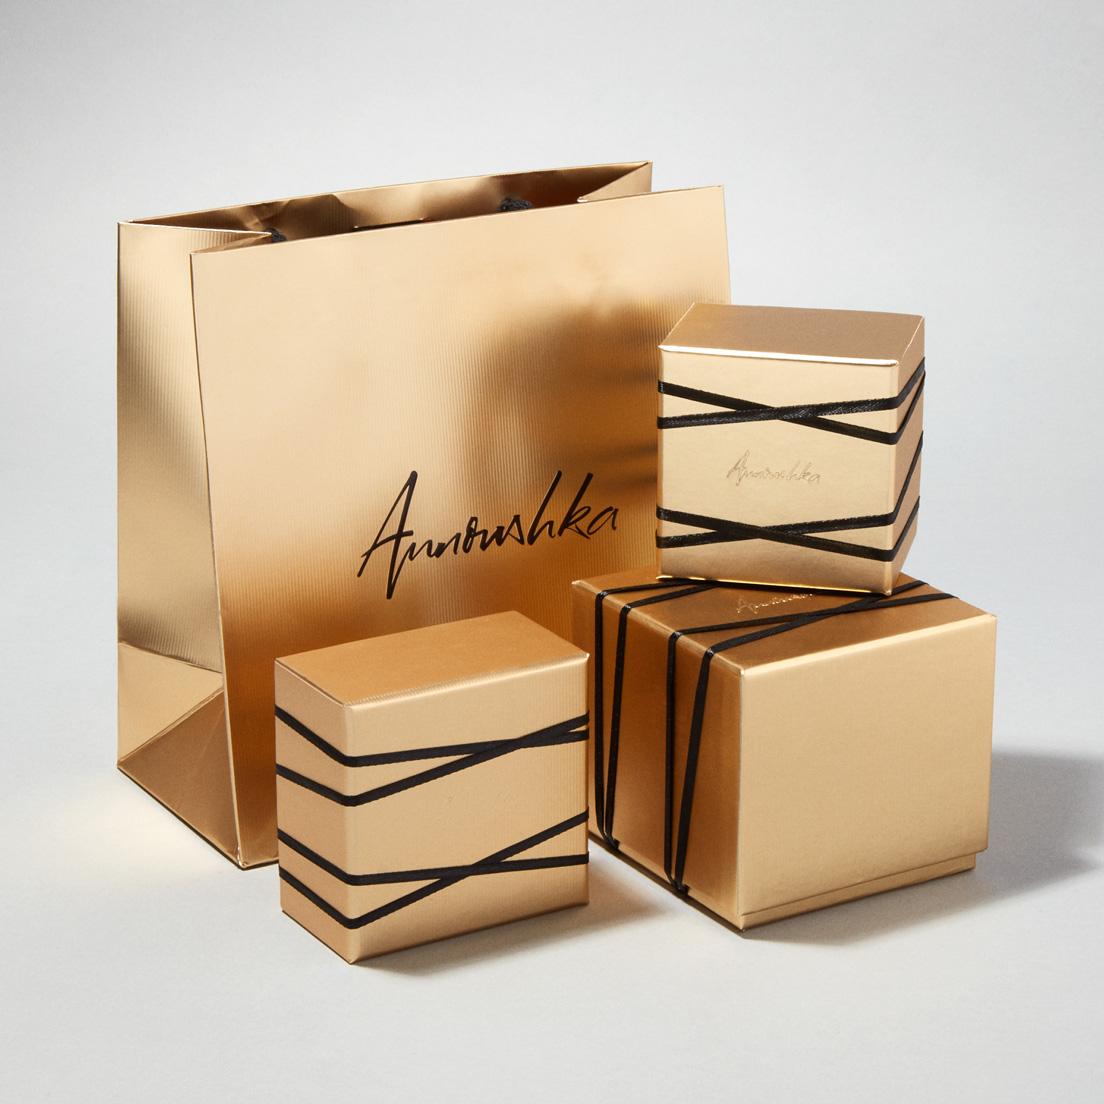 Annoushka gift wrap